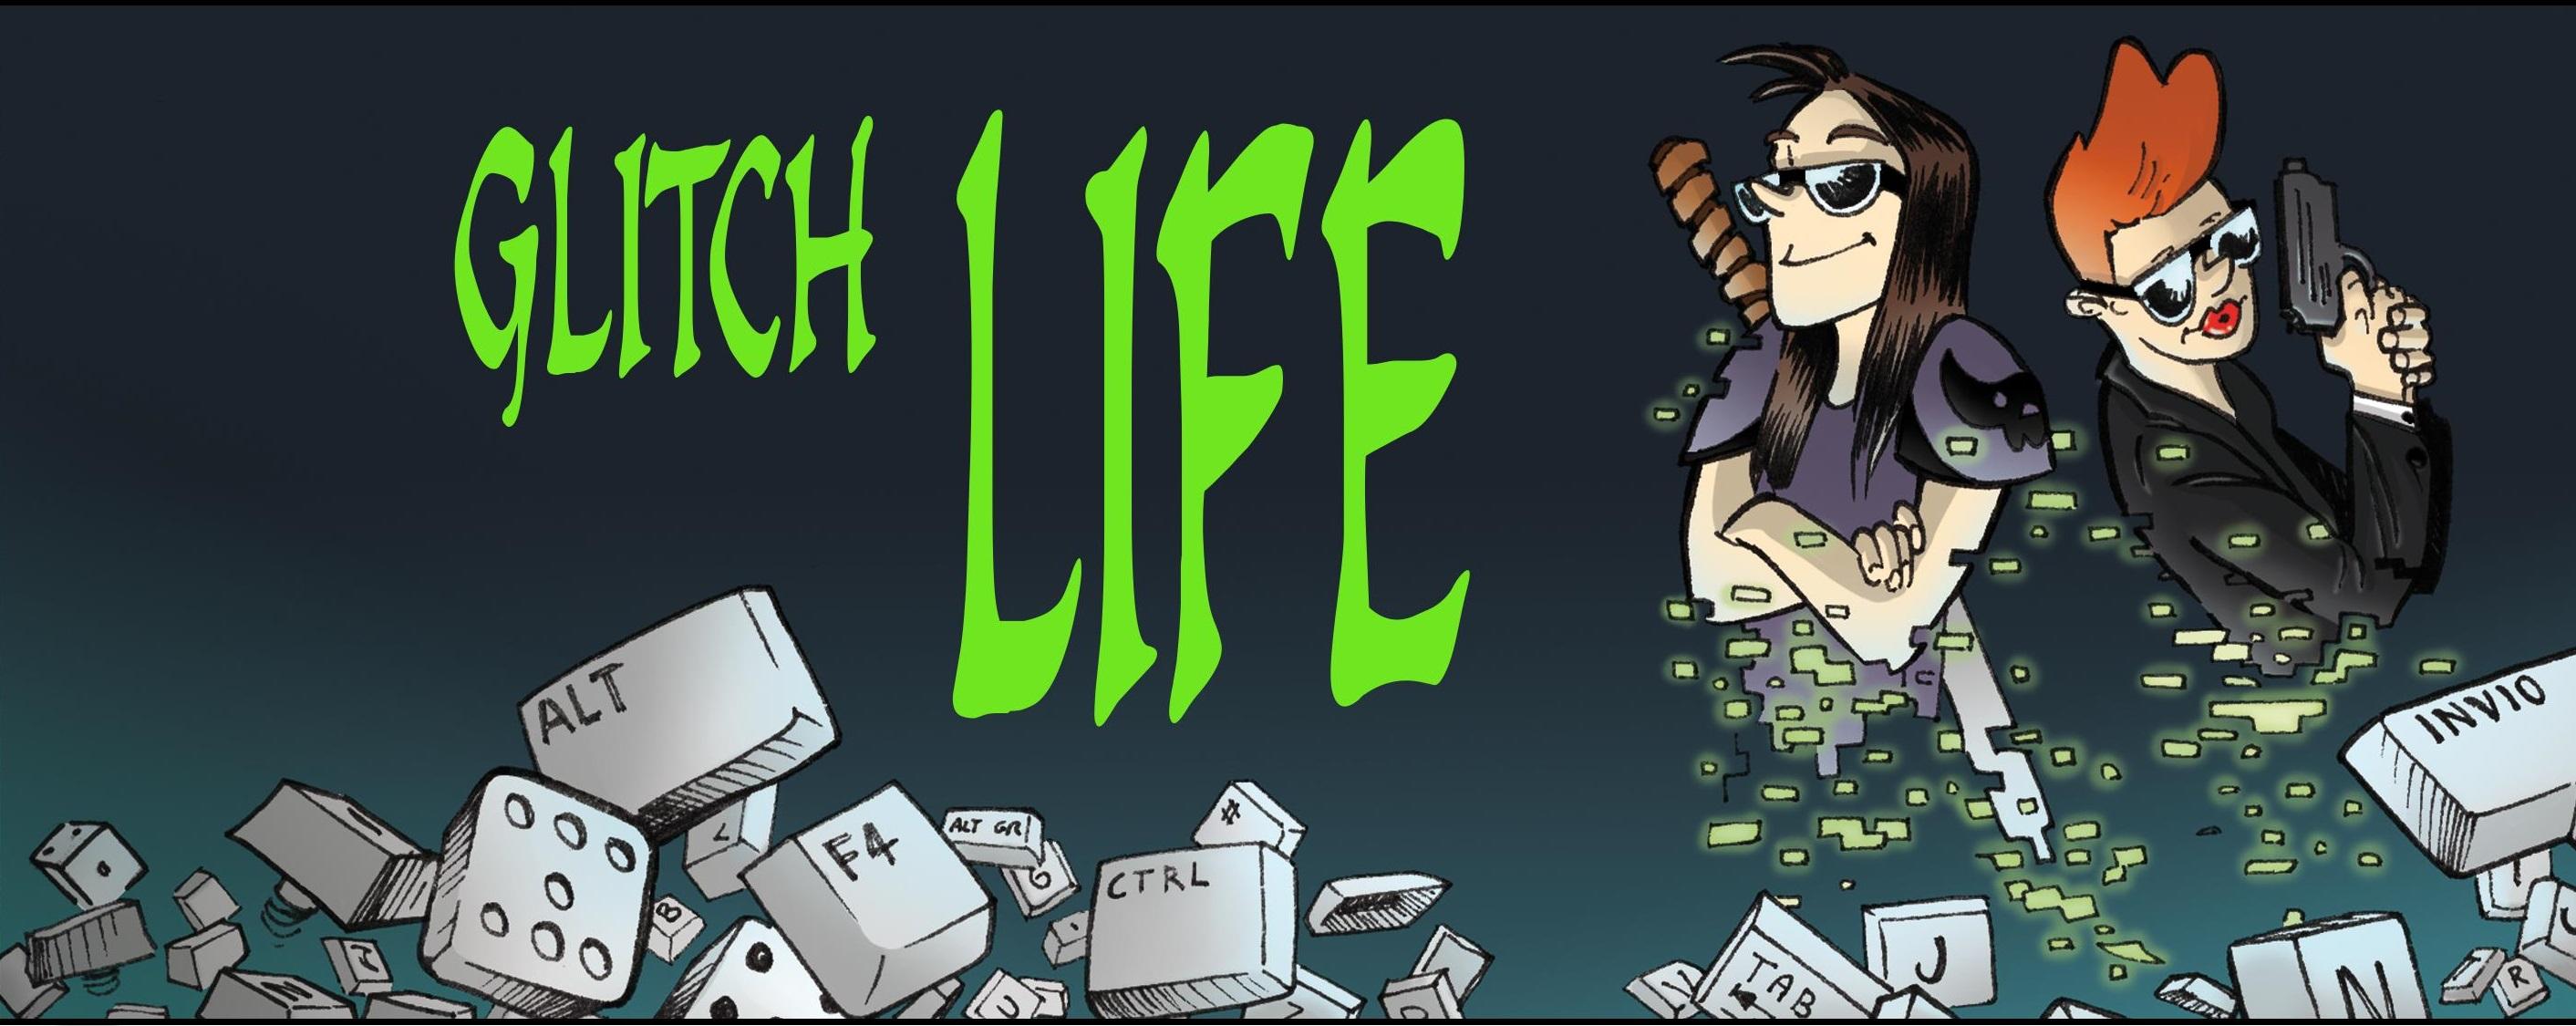 Glitch Life ep.3 #vitadanerd #citazioni